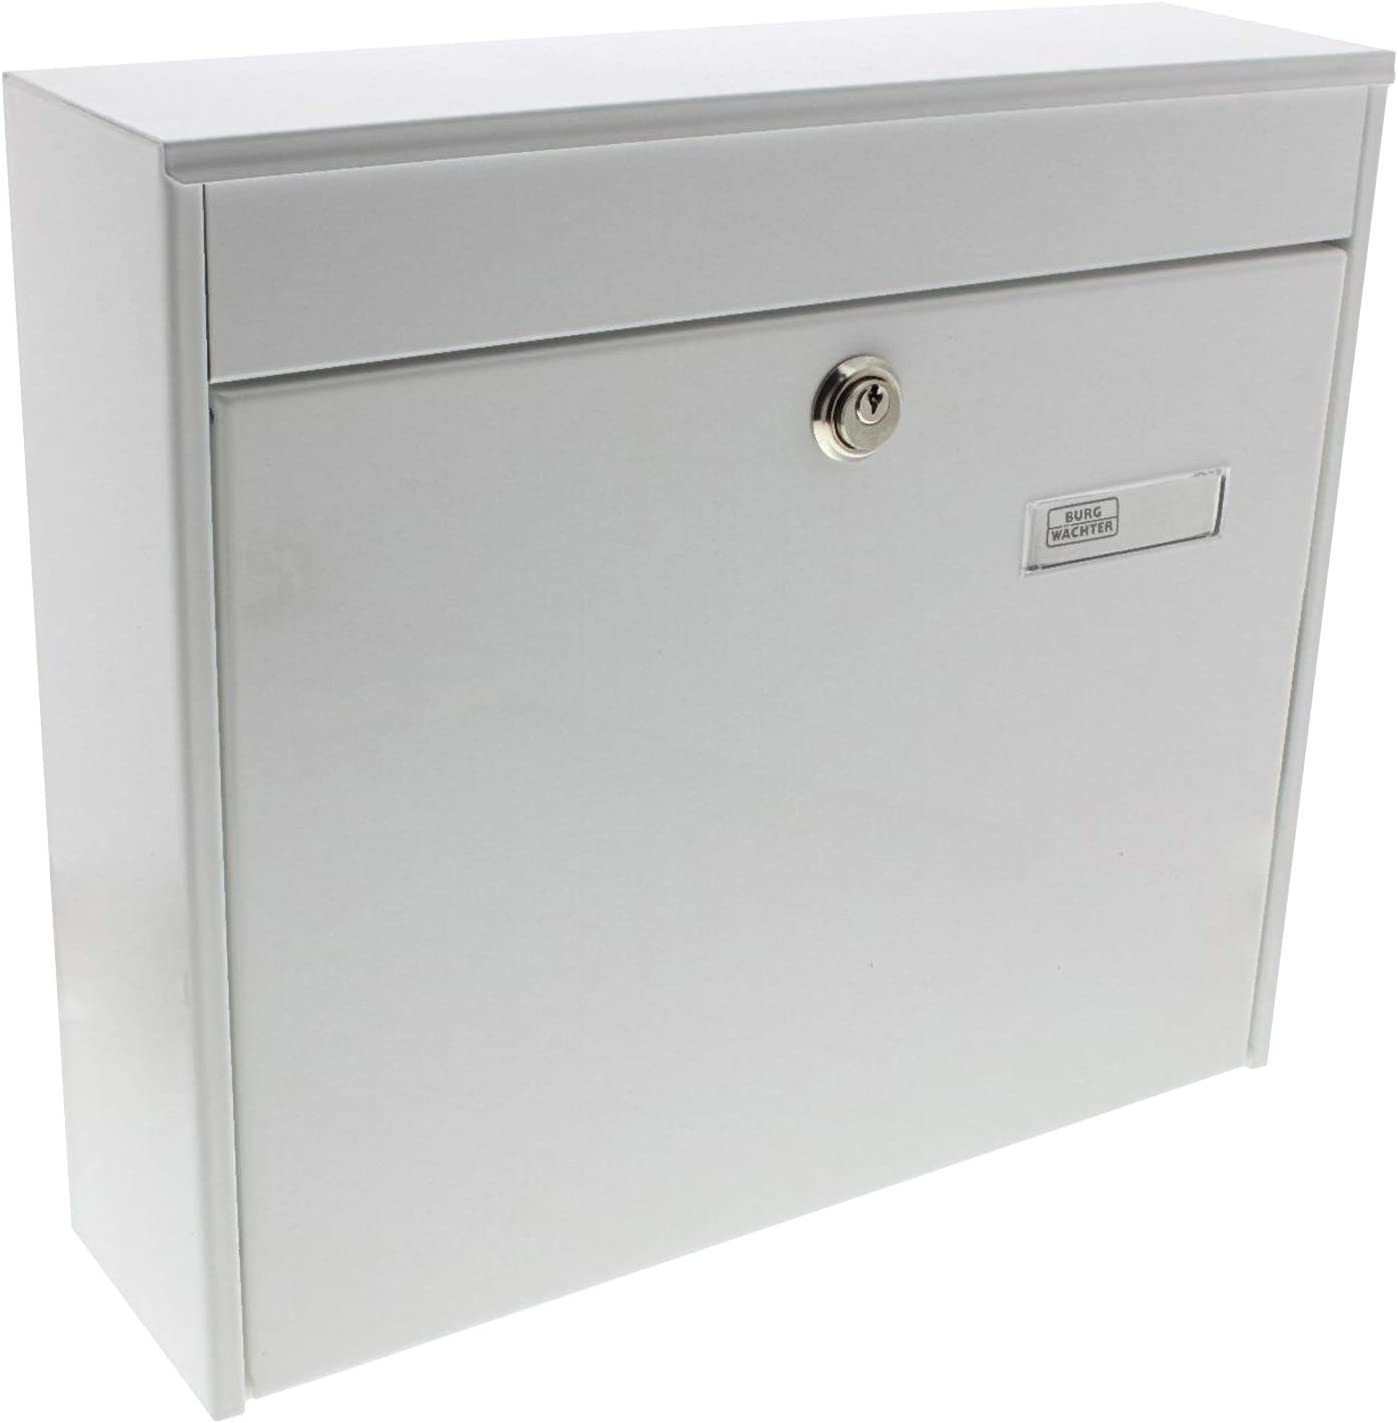 Burg-Wächter Group Mailbox Lowest price challenge A4 Letter Galvanized P Outlet sale feature Slot Steel